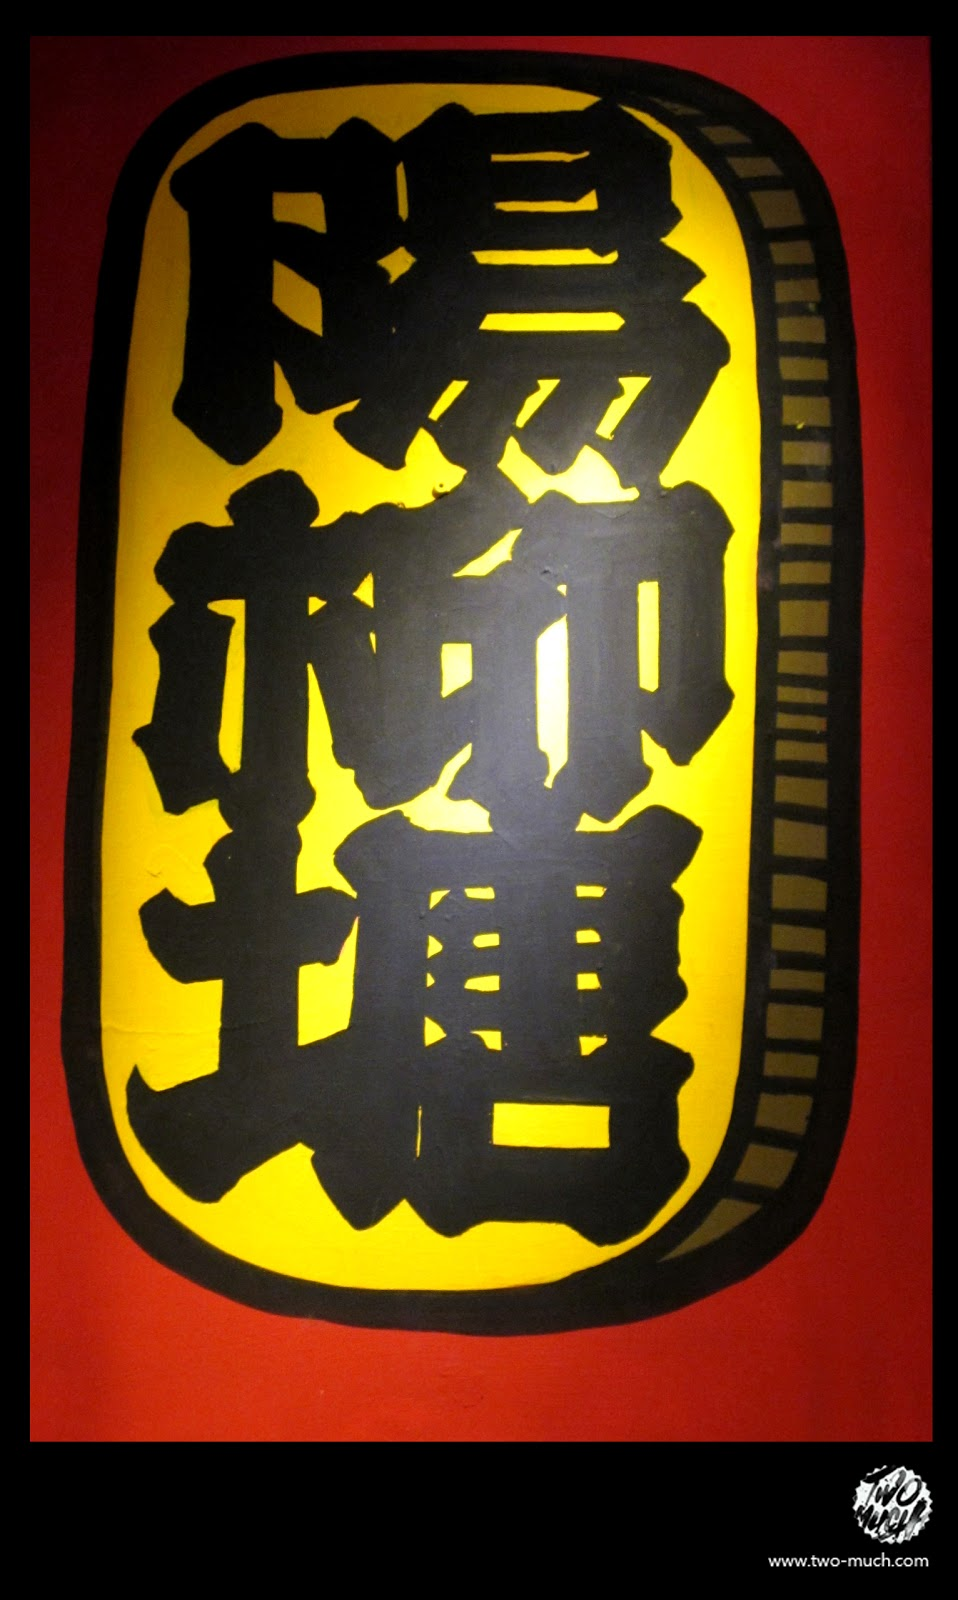 Two Much artwork studio: 日式浮世繪壁畫 - 陽柳塘薑母鴨